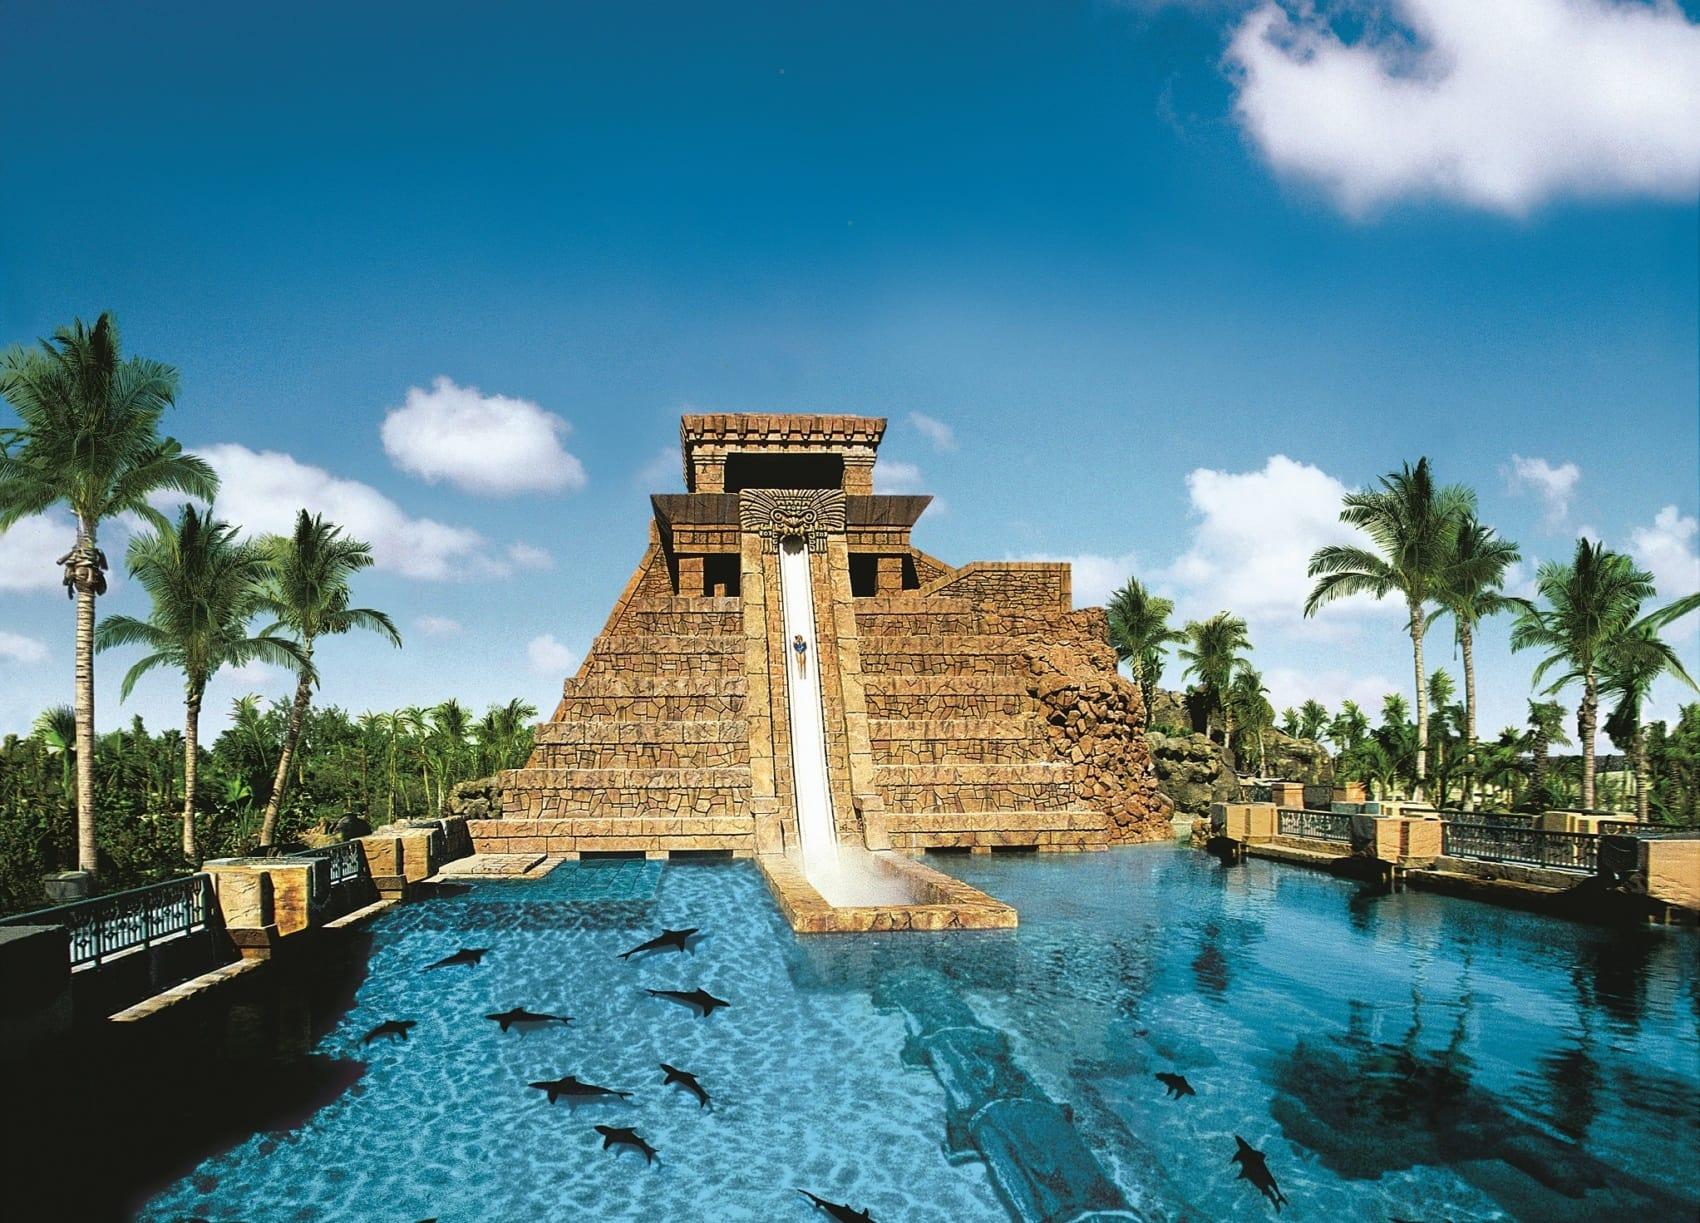 Water Park Nau Bahamas Best Rangda Ngora